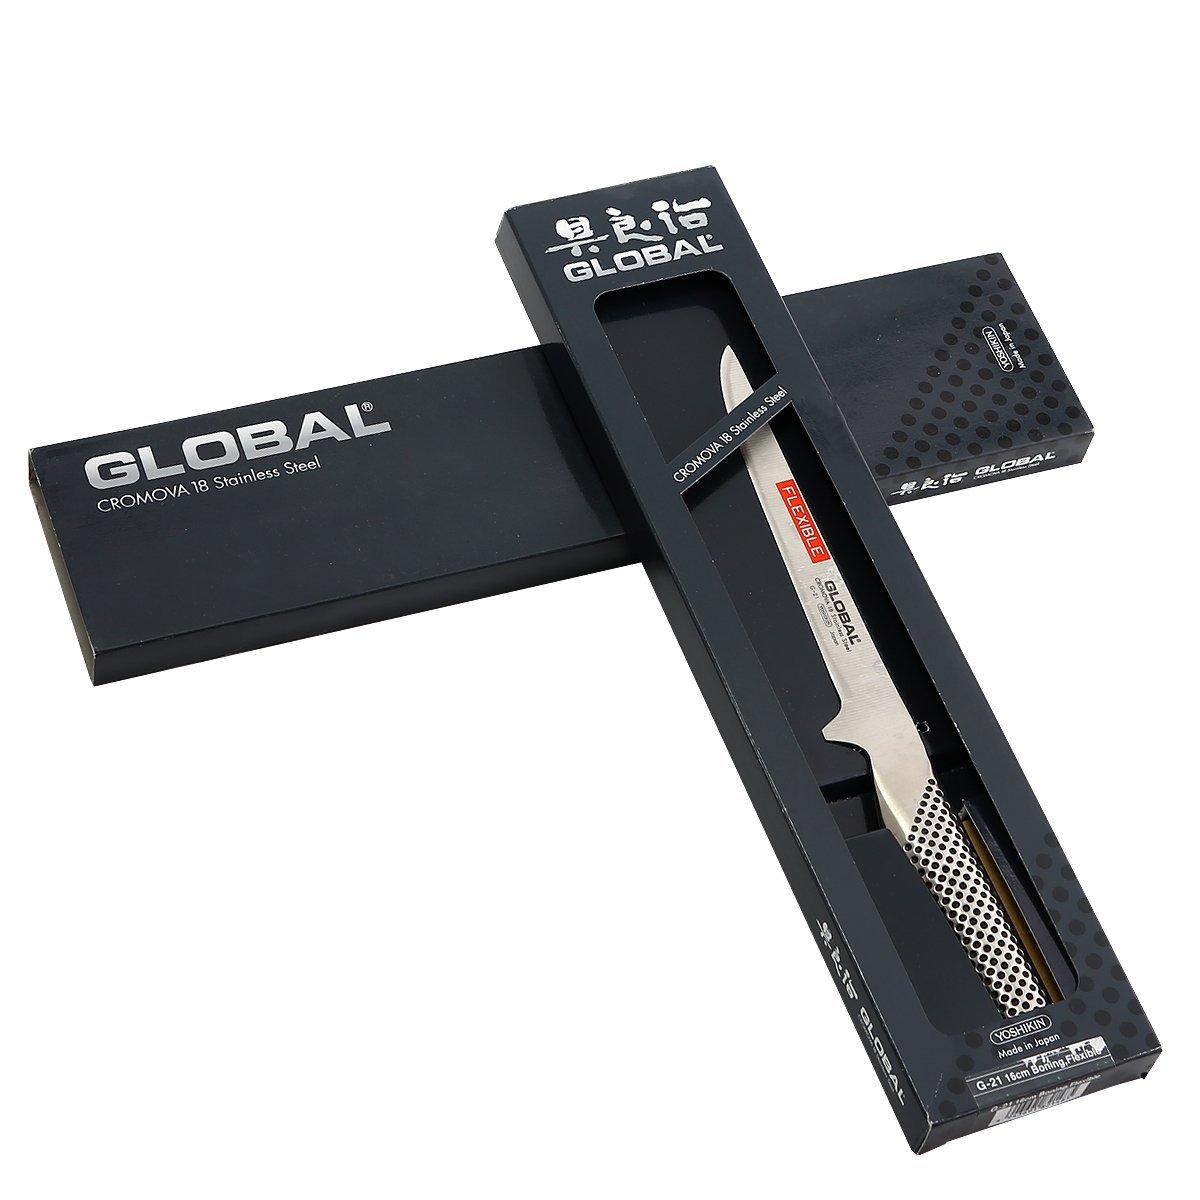 Vanadium Steel Global Knives Review Global Cromova G 21 6 1 4 Inch 16cm Flexible